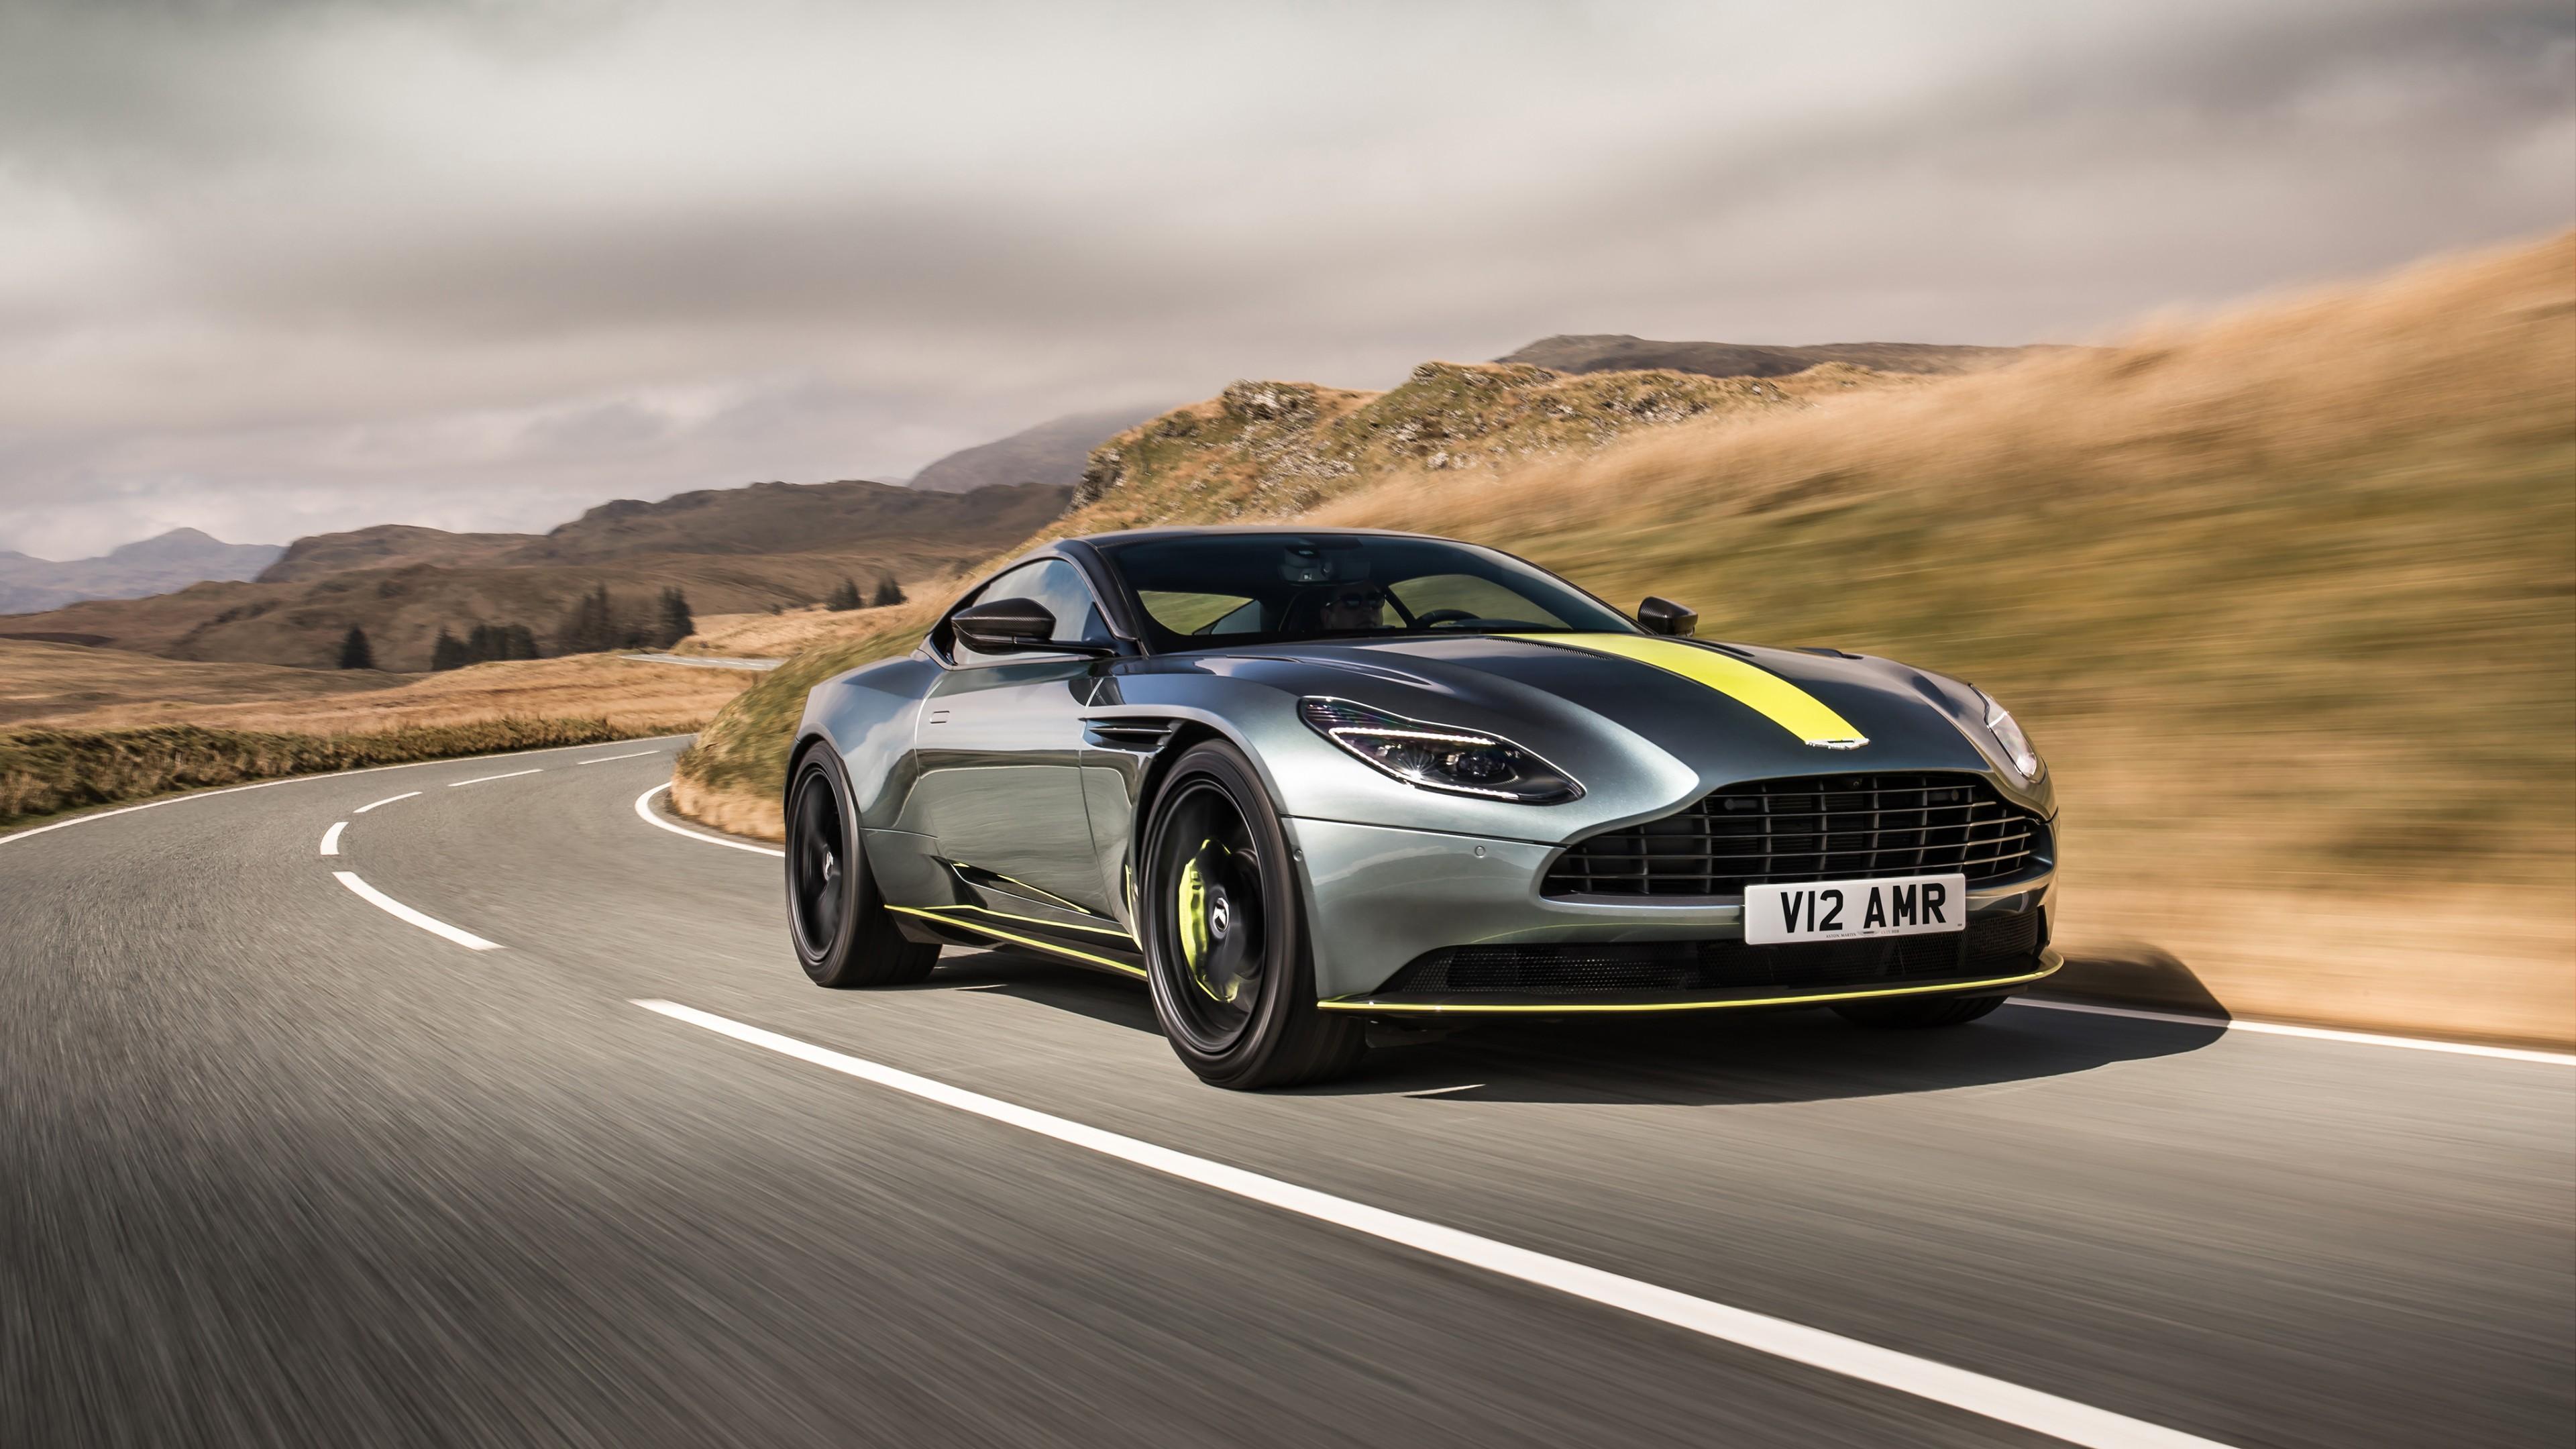 2018 Aston Martin Db11 Amr Signature Edition 4k Wallpaper